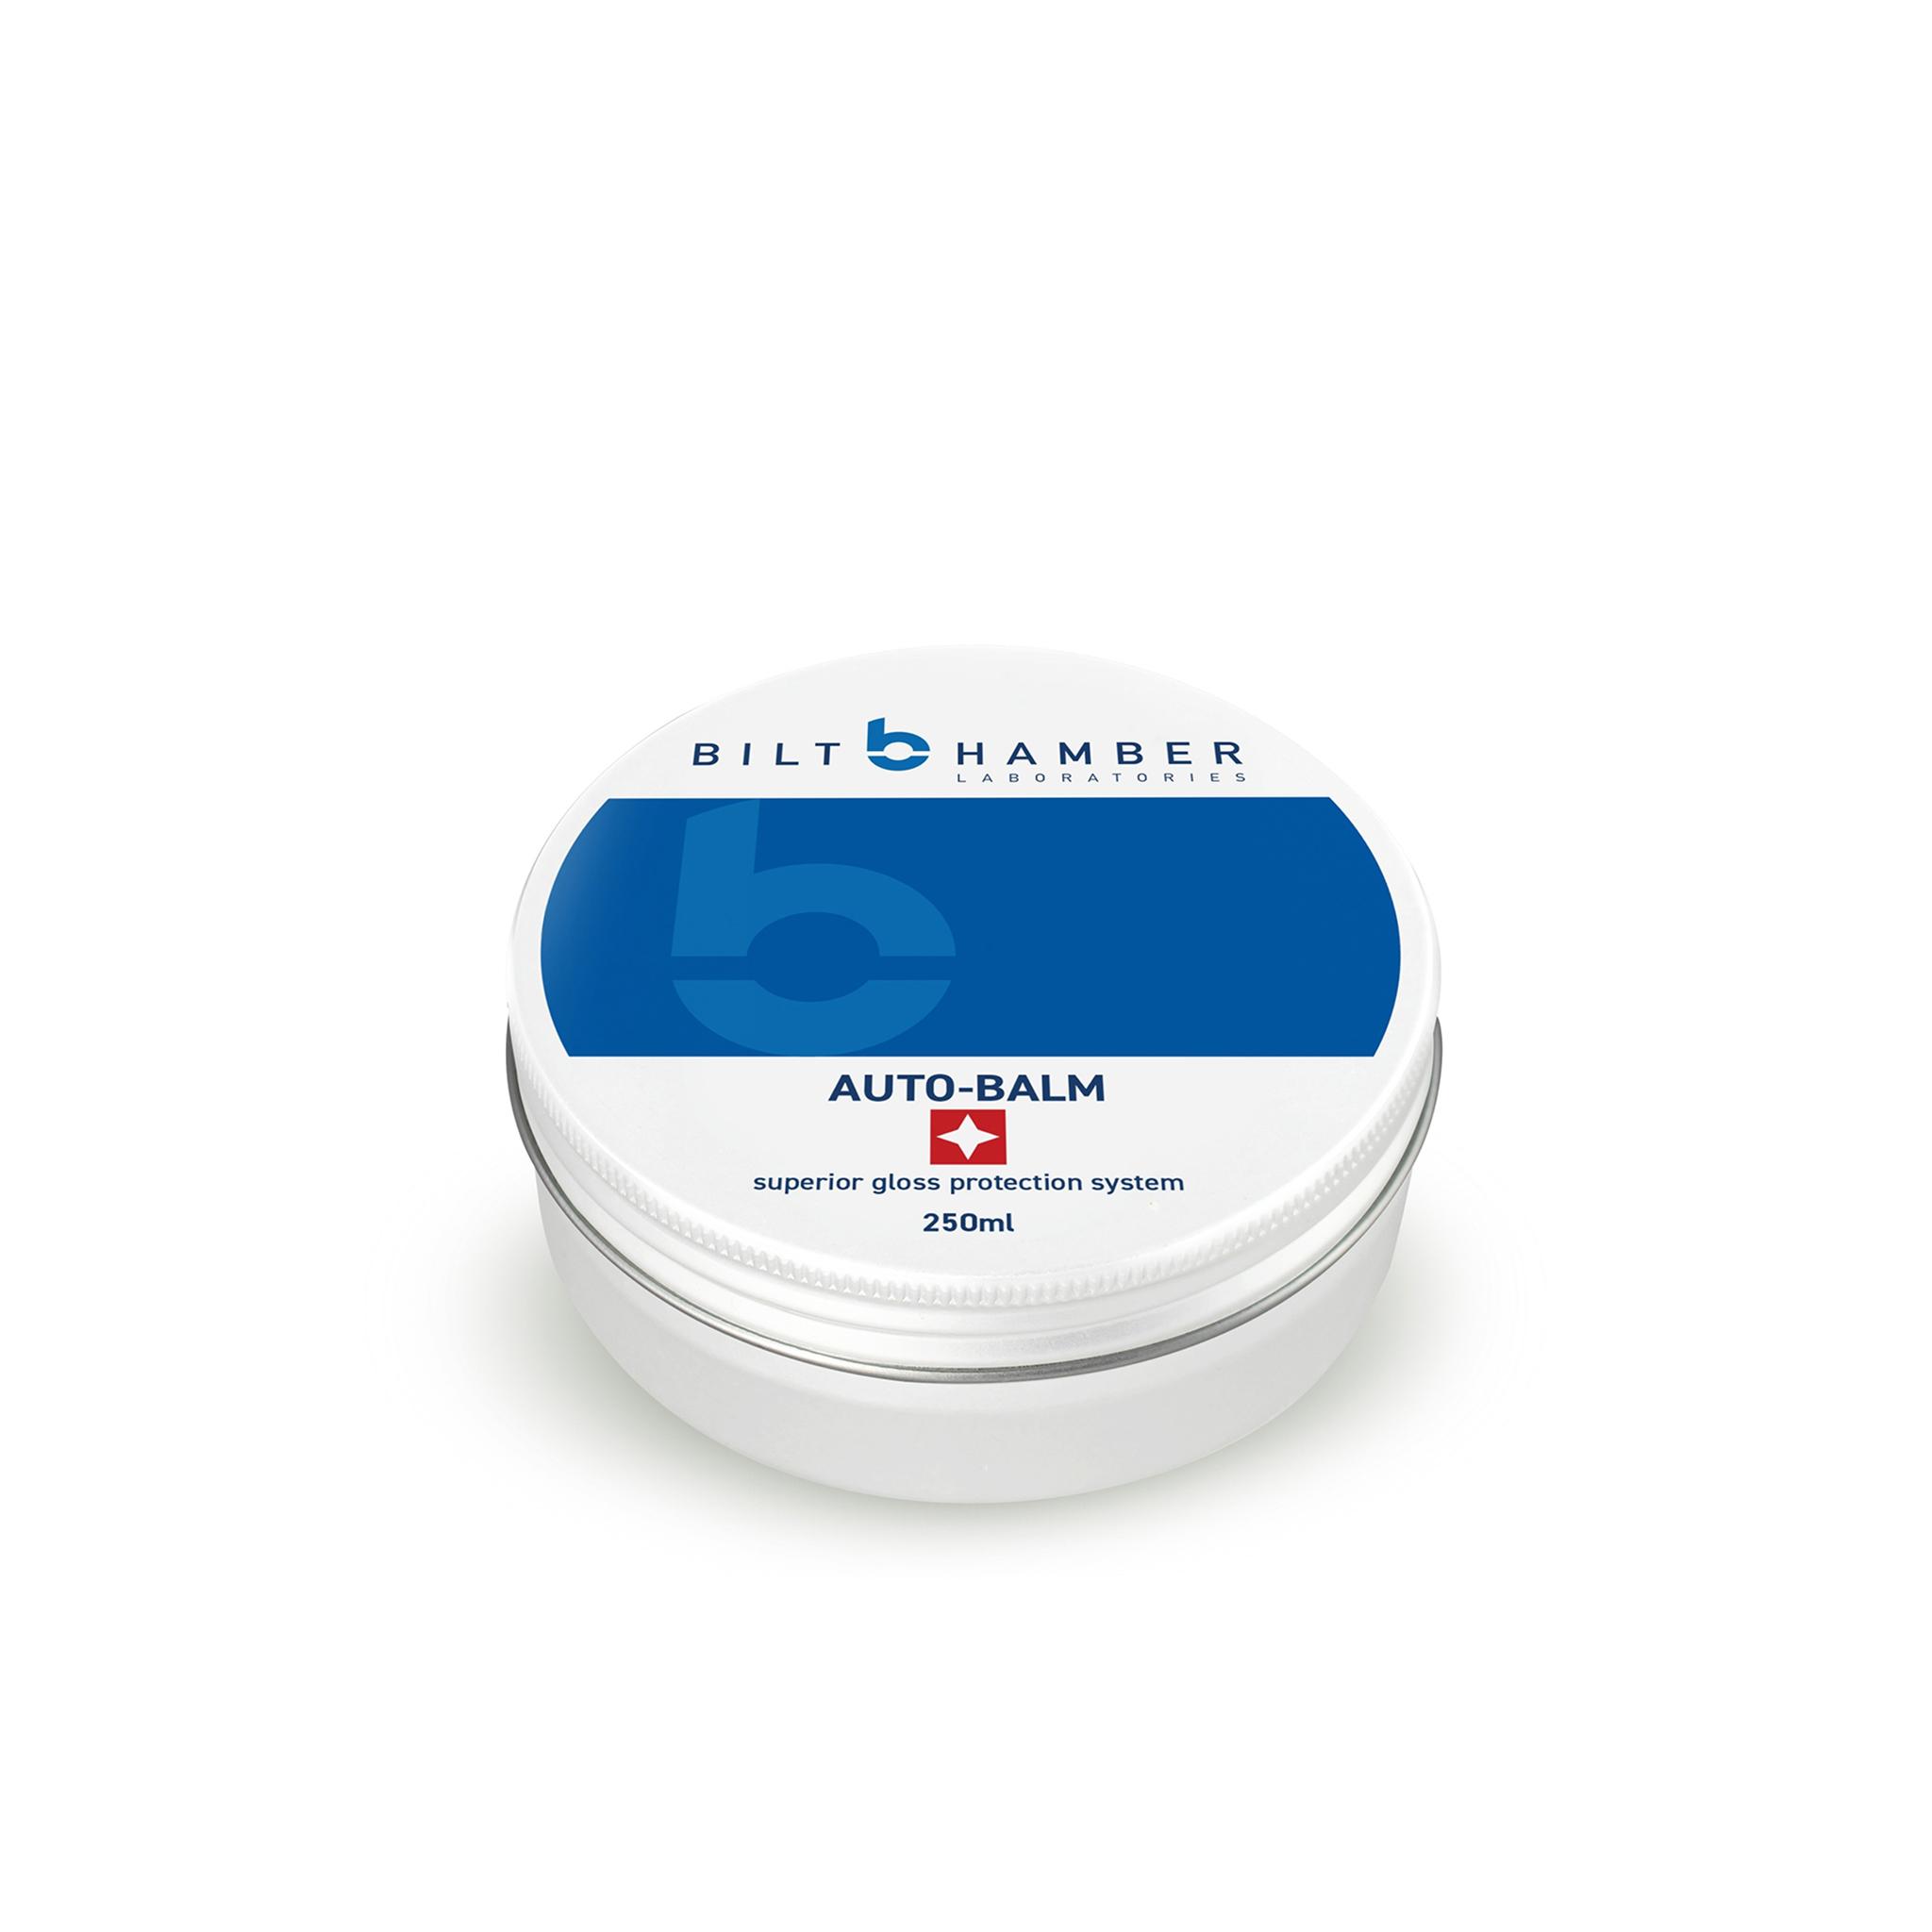 Bilvax Bilt Hamber Auto-Balm, 250 ml